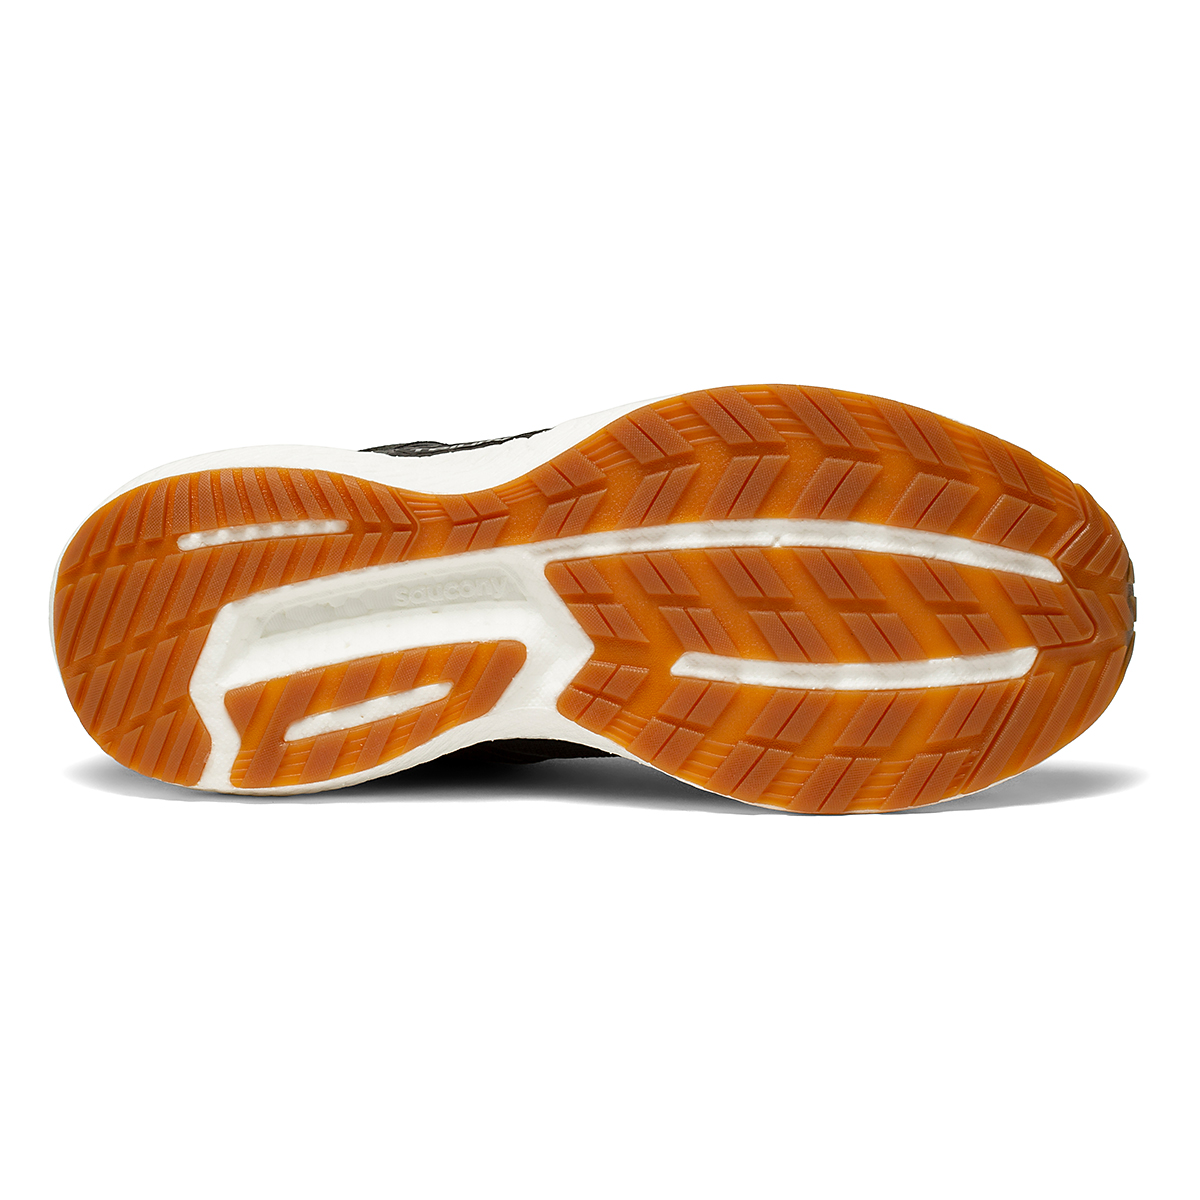 Men's Saucony Triumph 19 Running Shoe - Color: Black/Gum - Size: 7 - Width: Regular, Black/Gum, large, image 5